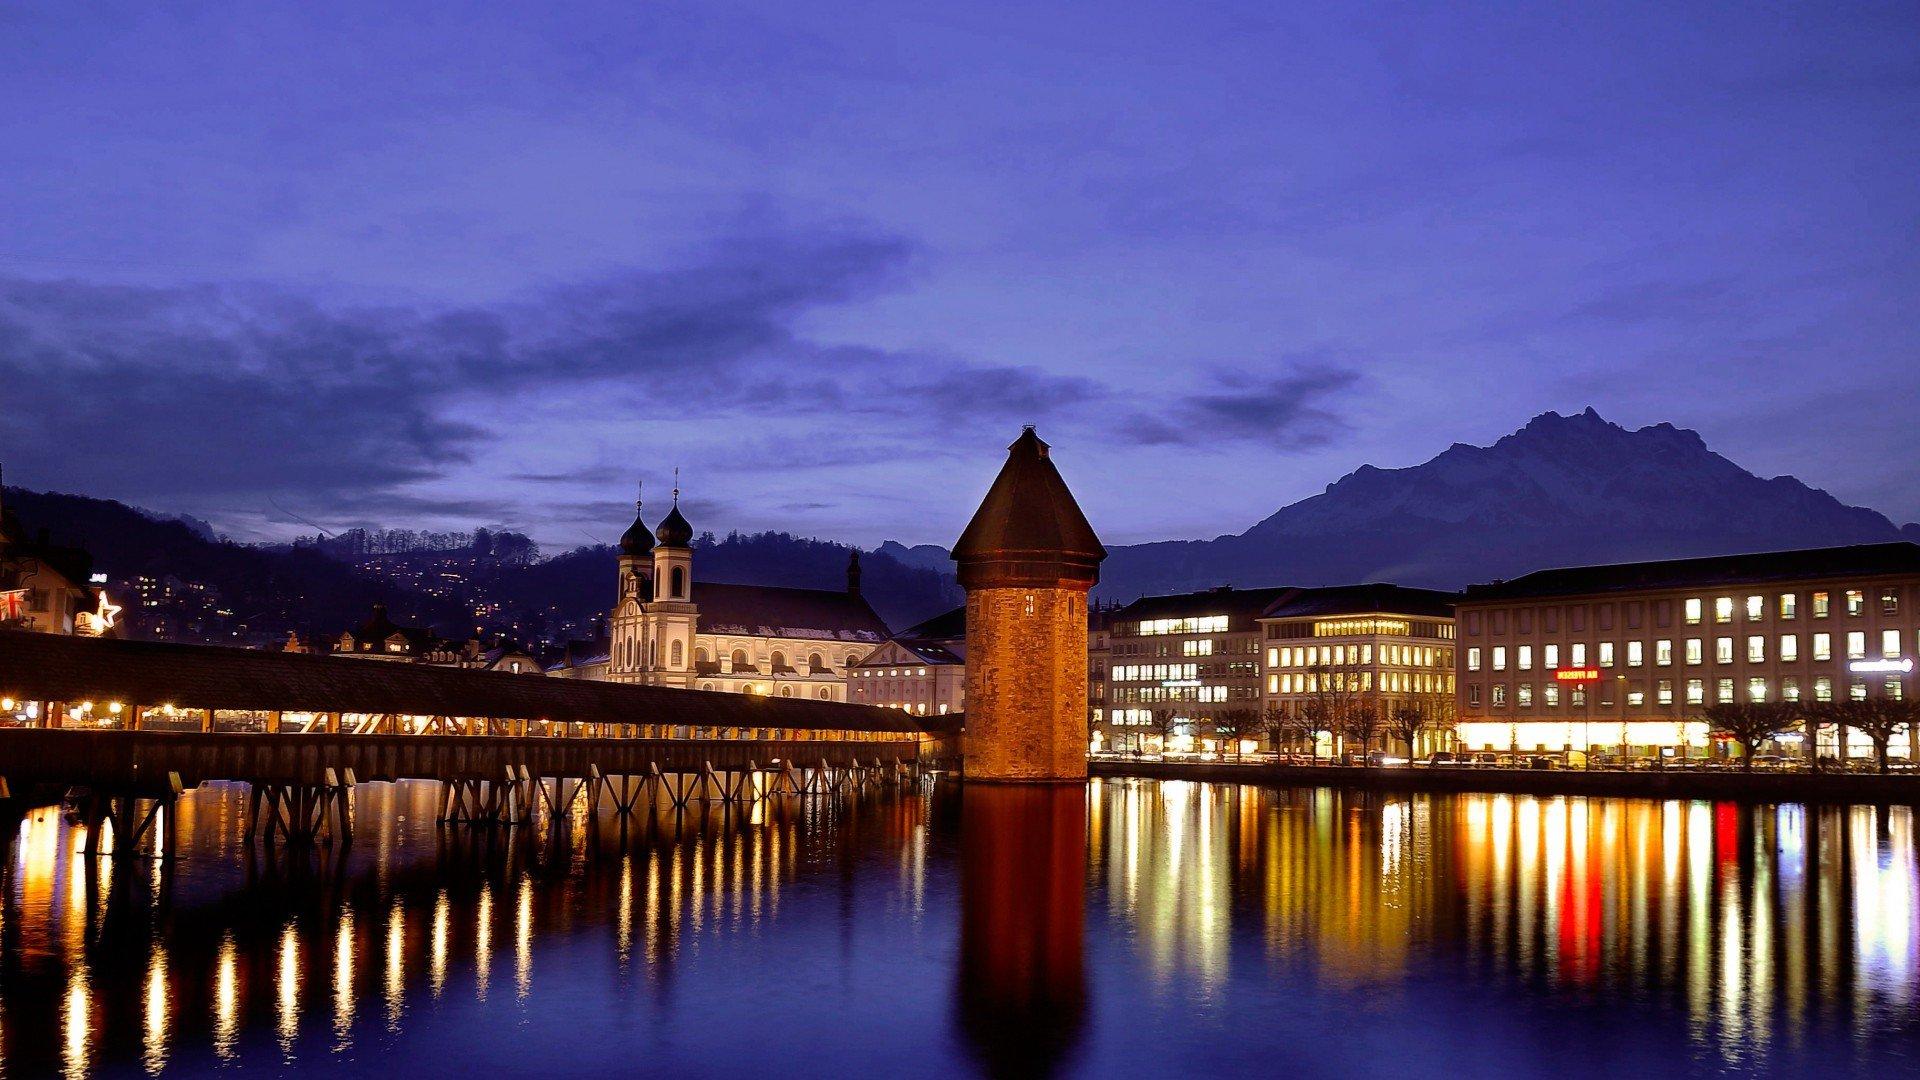 Switzerland night hd world 4k wallpapers images - Switzerland wallpaper full hd ...